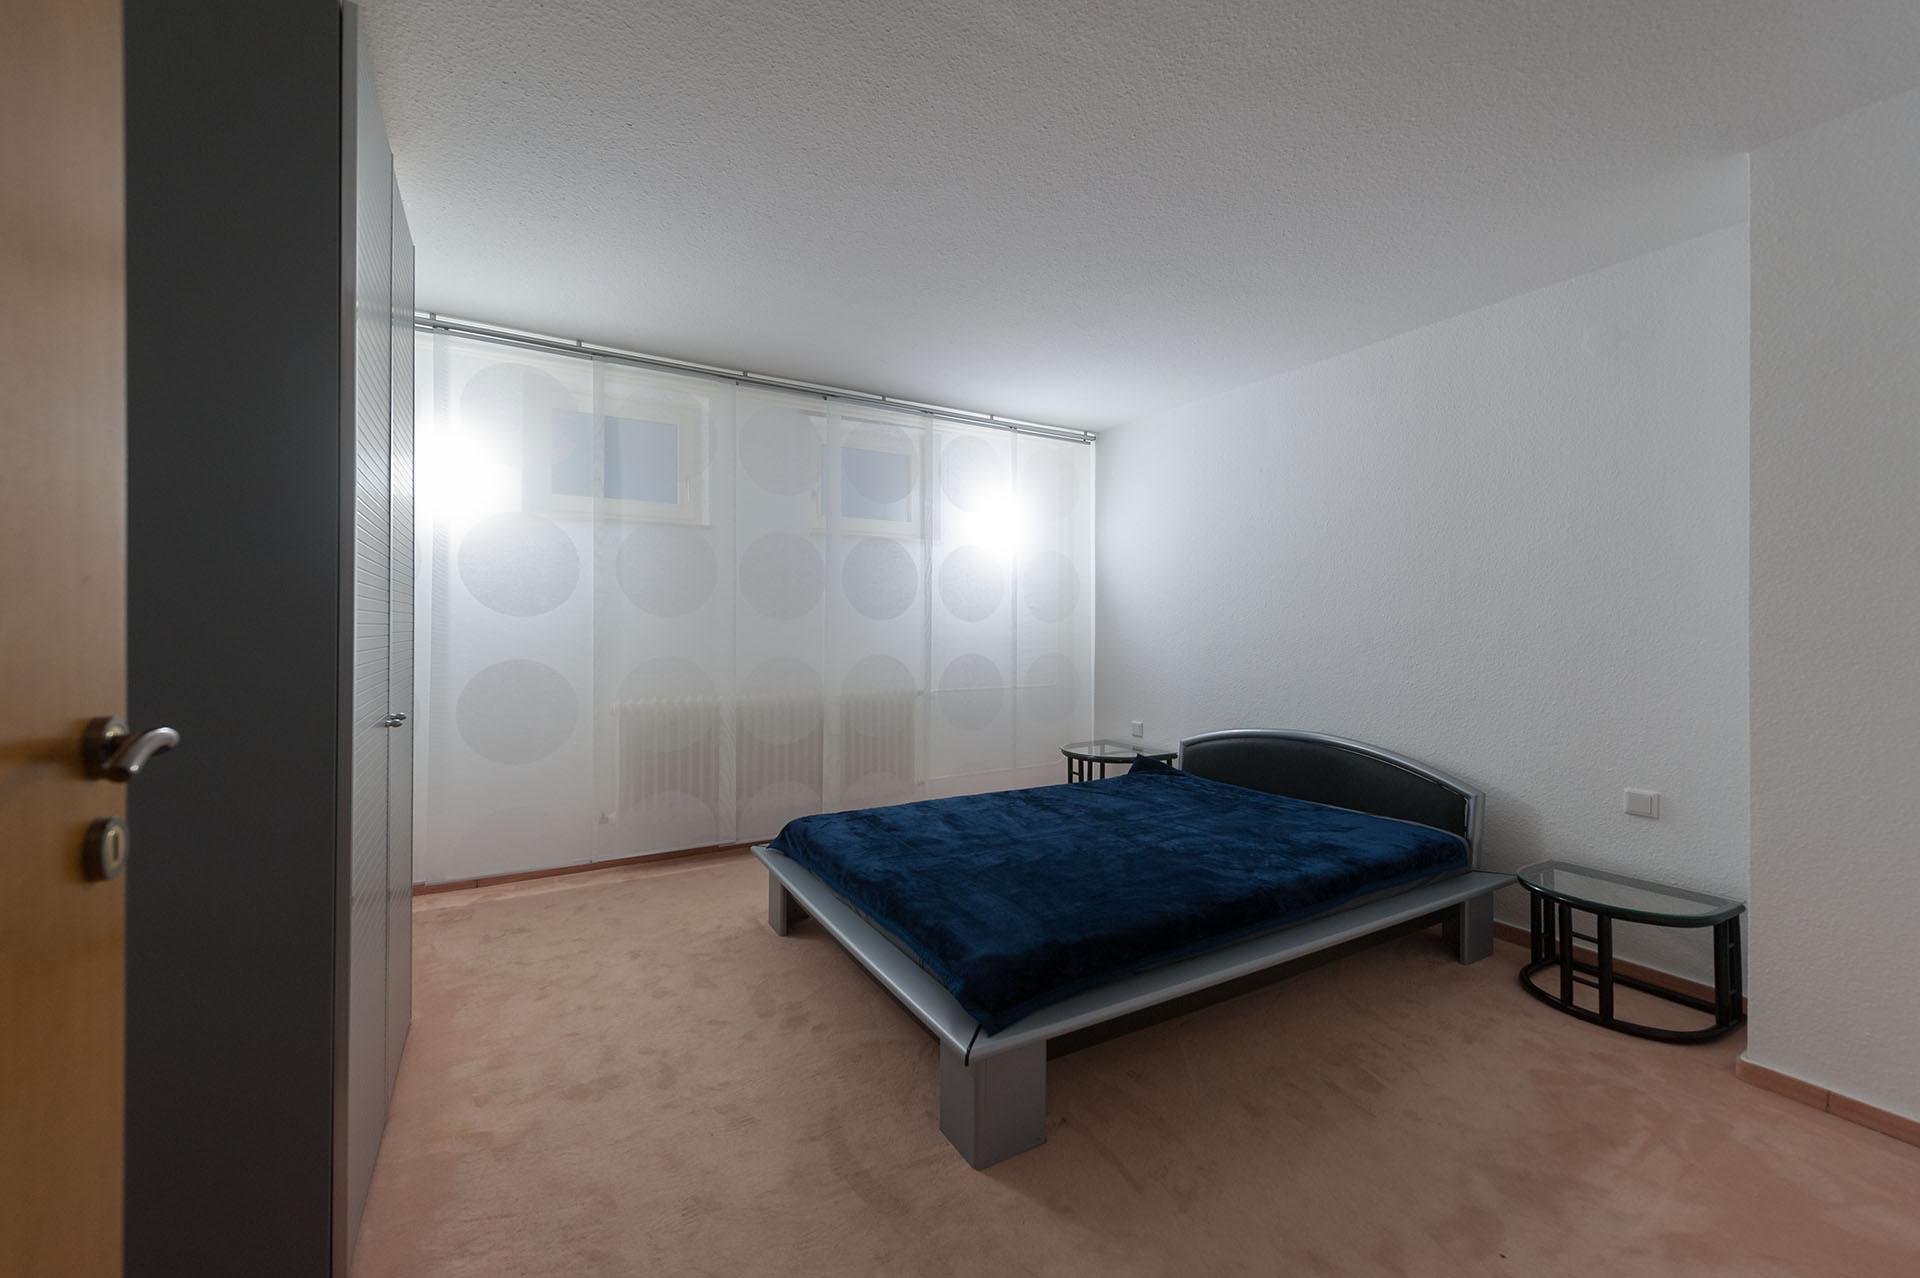 Immobilien-Fotografie